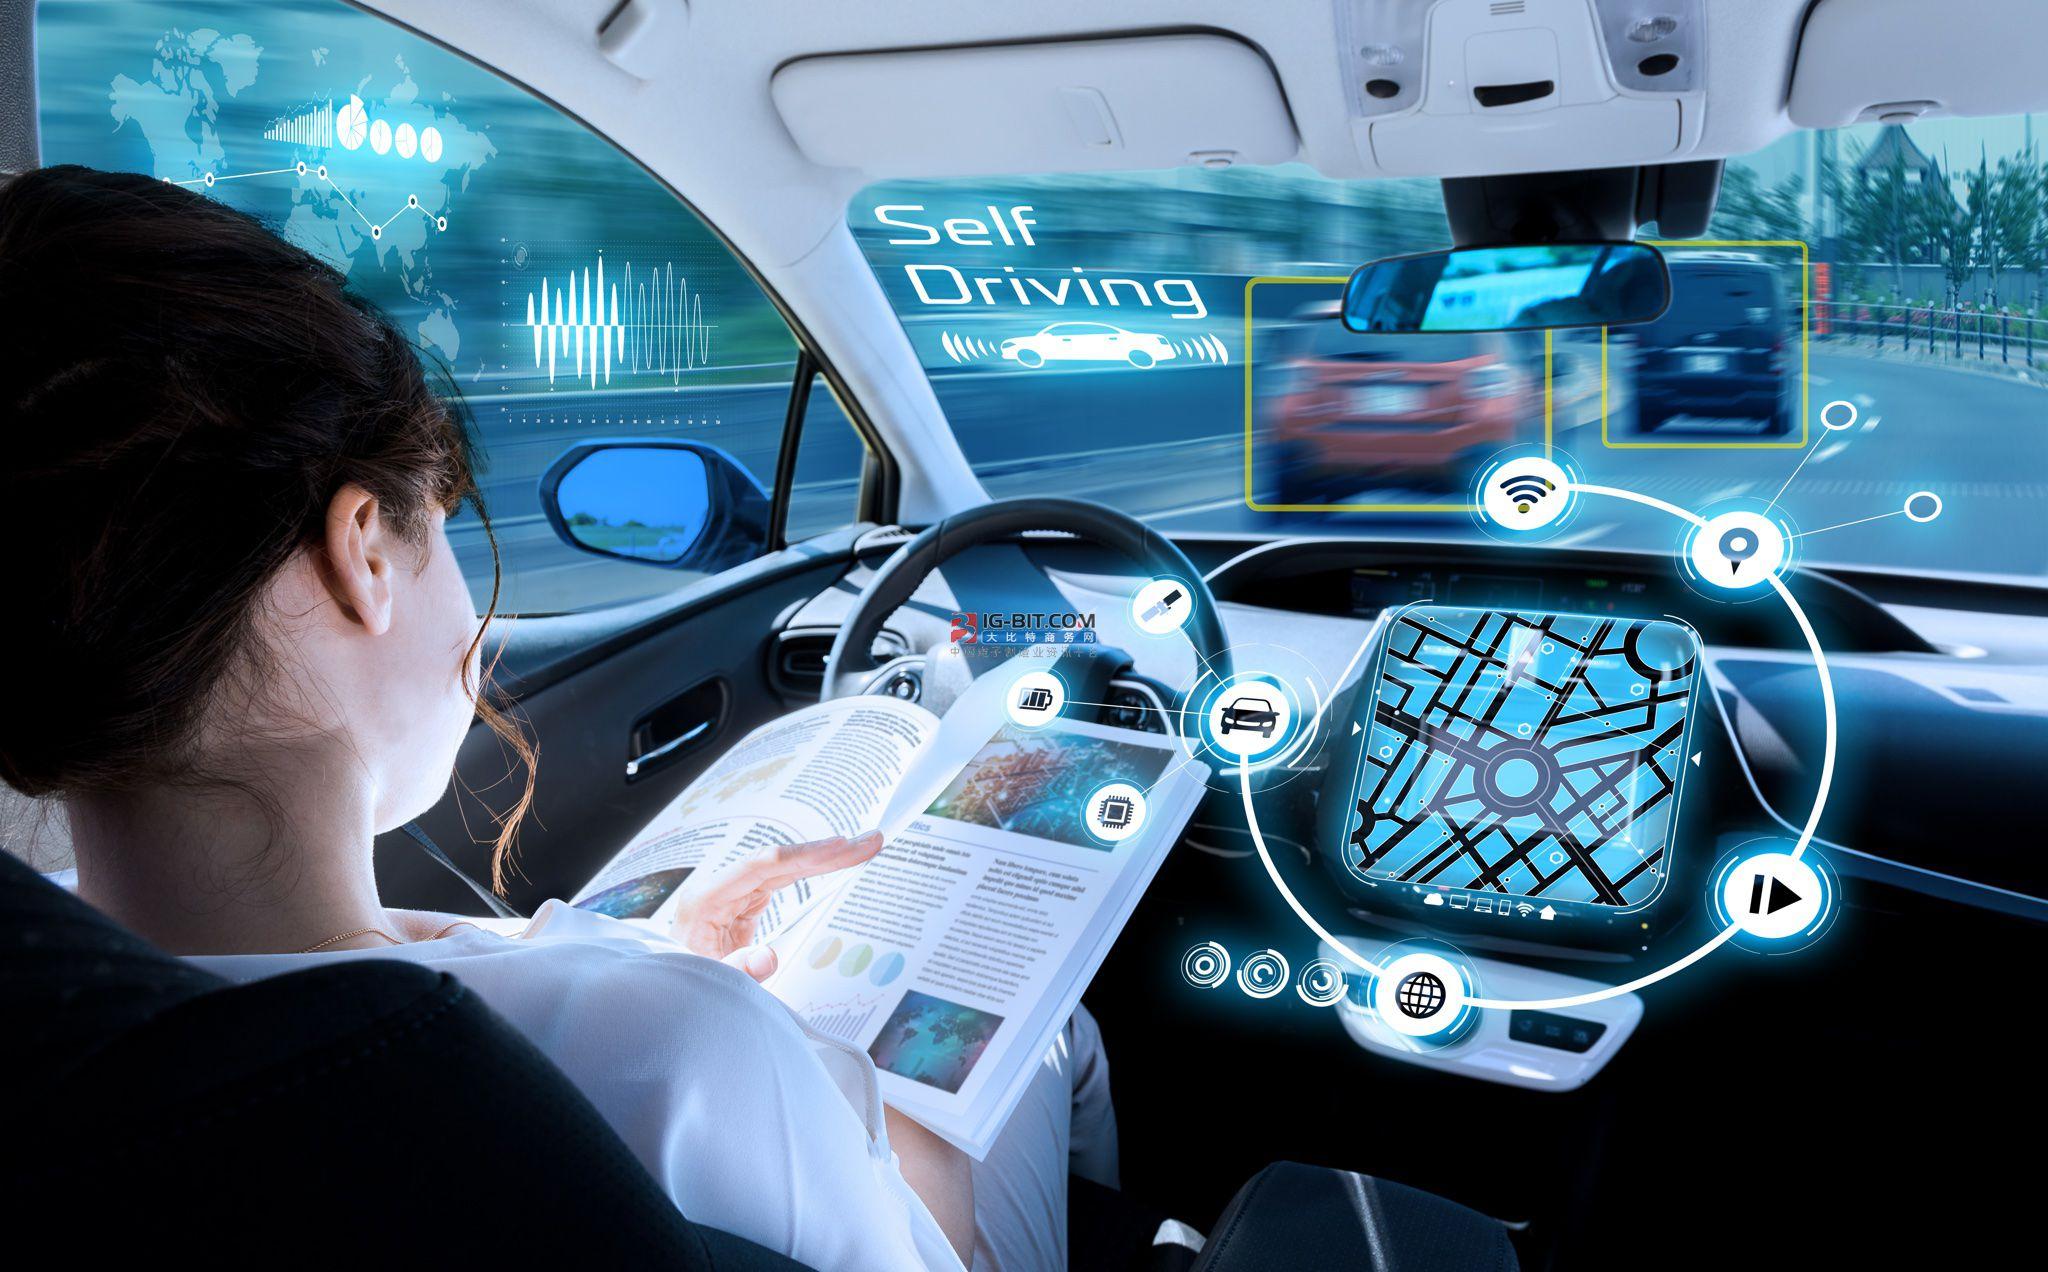 2021nianquan球无ren驾驶汽车市场规模将da70亿美yuan